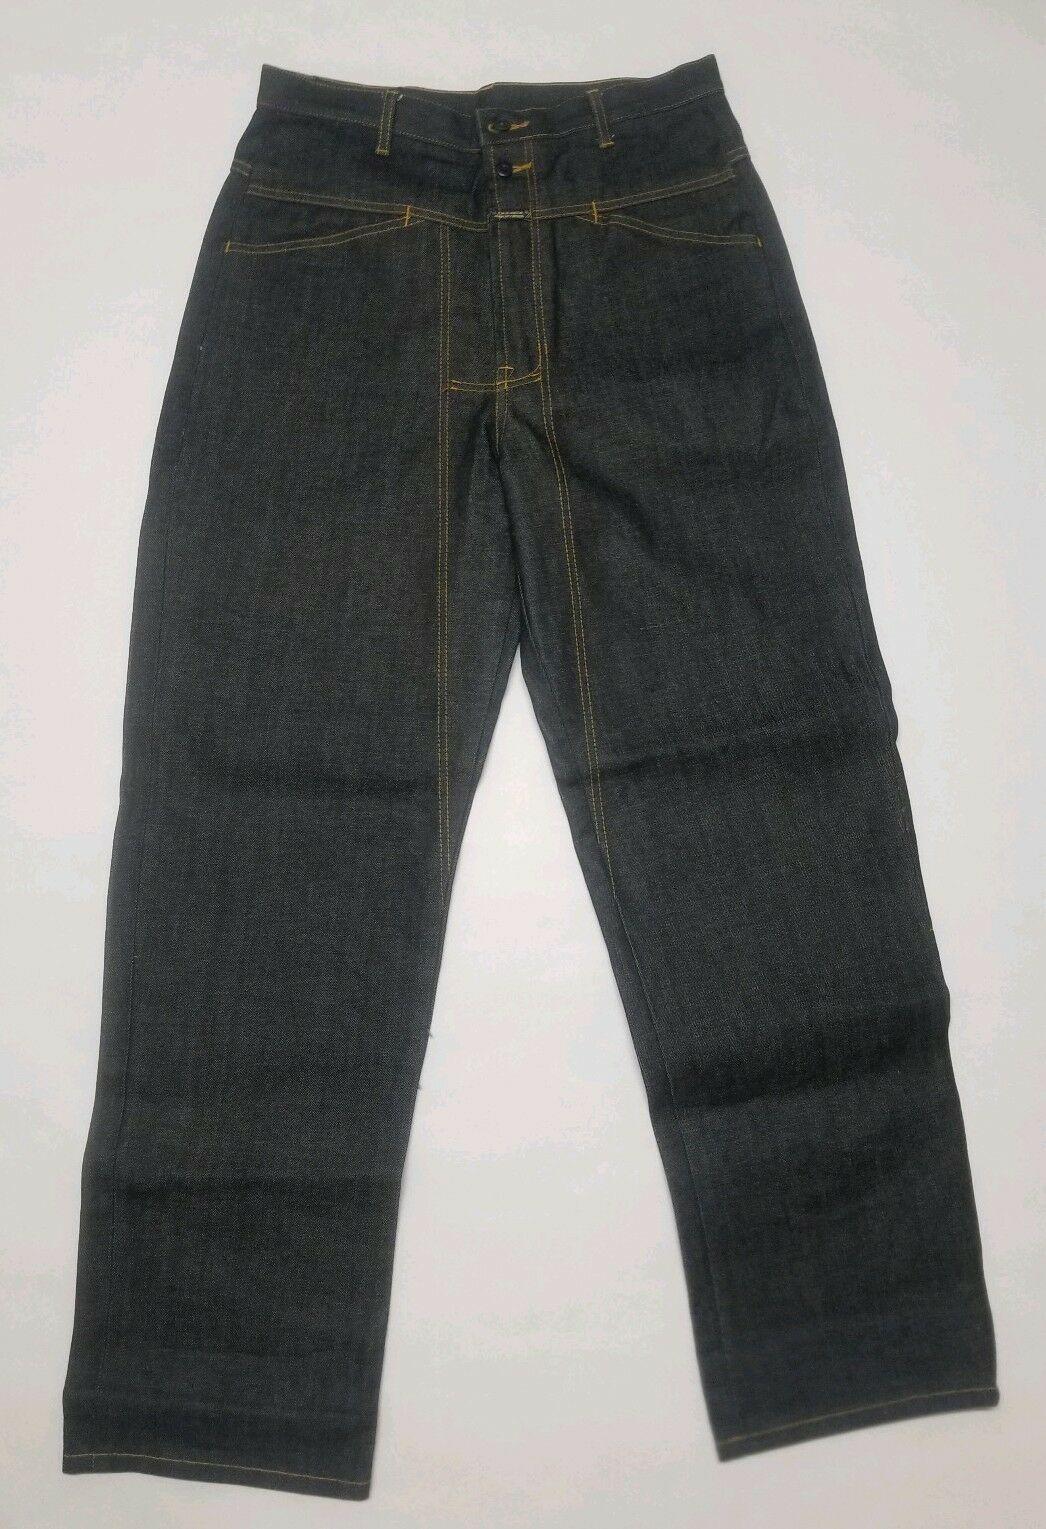 5f3195c4 Details about Marithe Francois Girbaud Dark Wash Denim Jeans Mens 38 ...